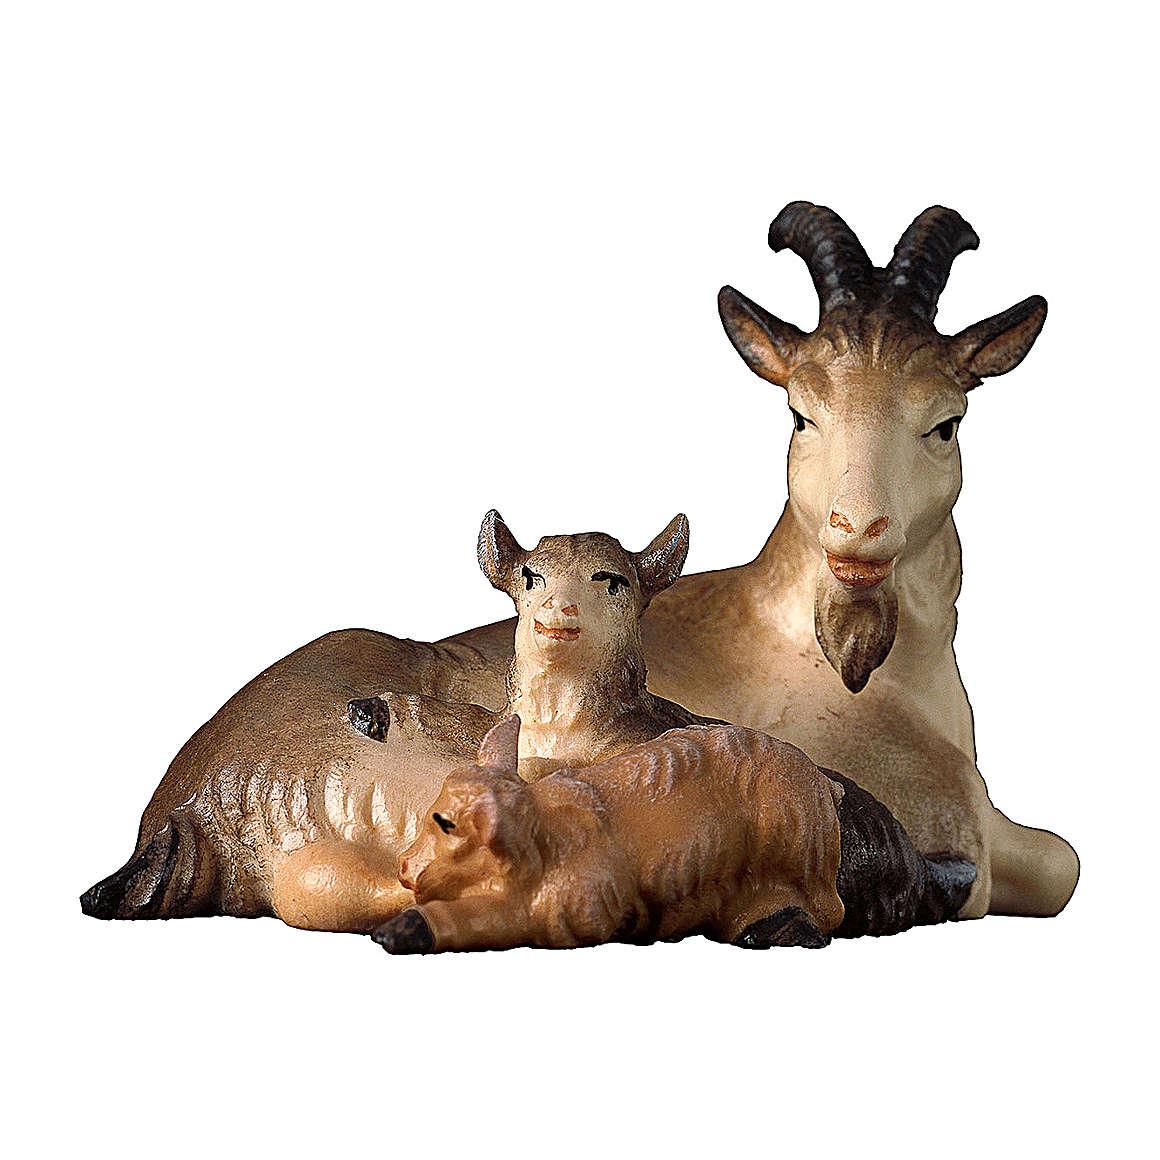 Capra sdraiata con due caprette presepe Original legno dipinto Valgardena 12 cm 4